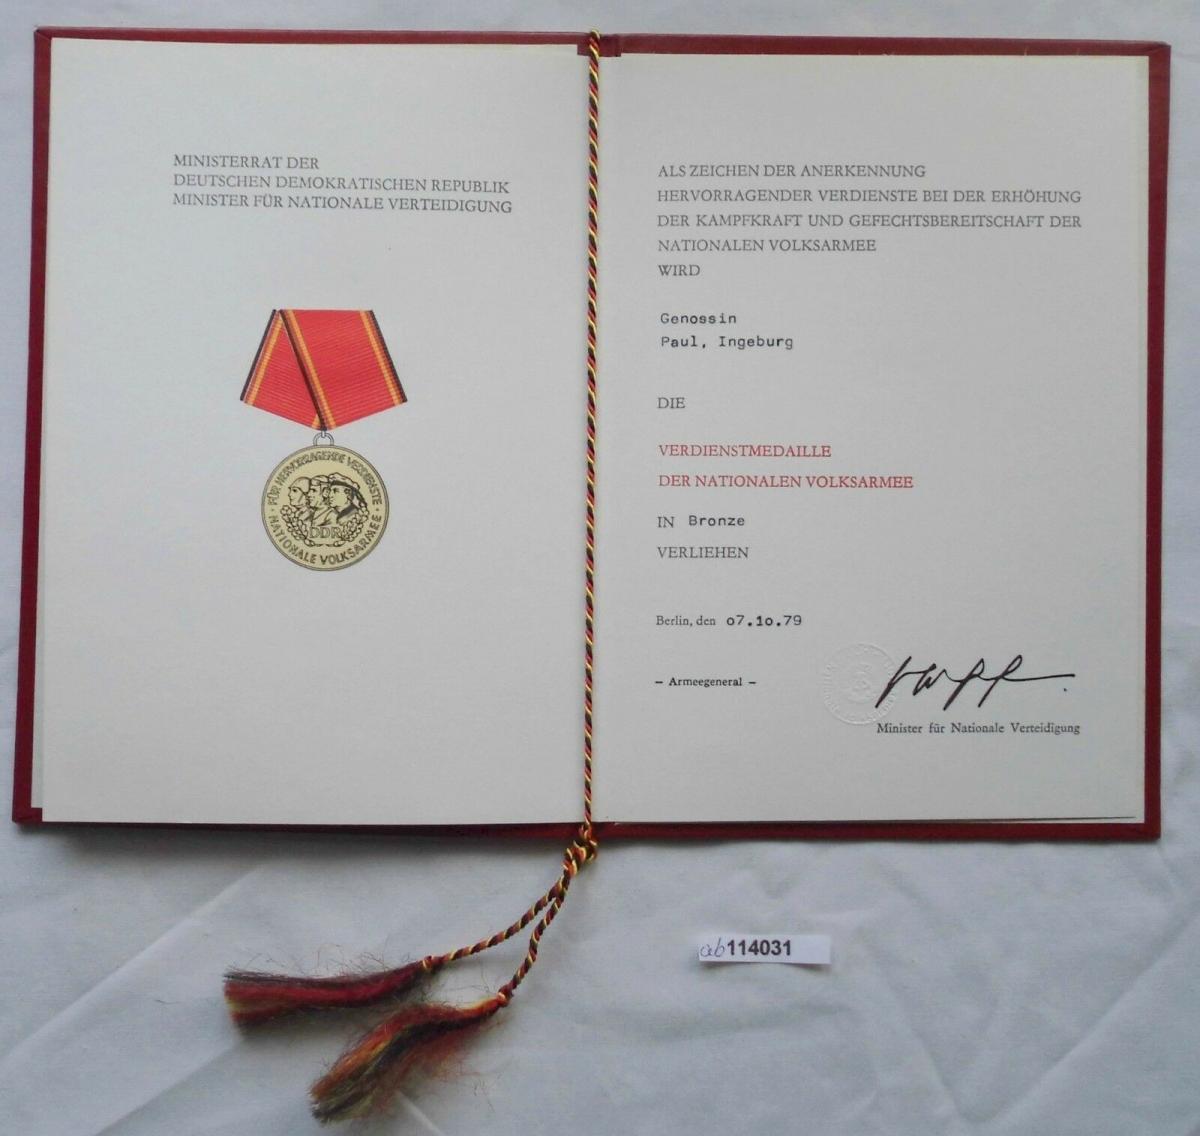 DDR Urkunde Verdienstmedaille der NVA in Bronze 1979 (114031) 0